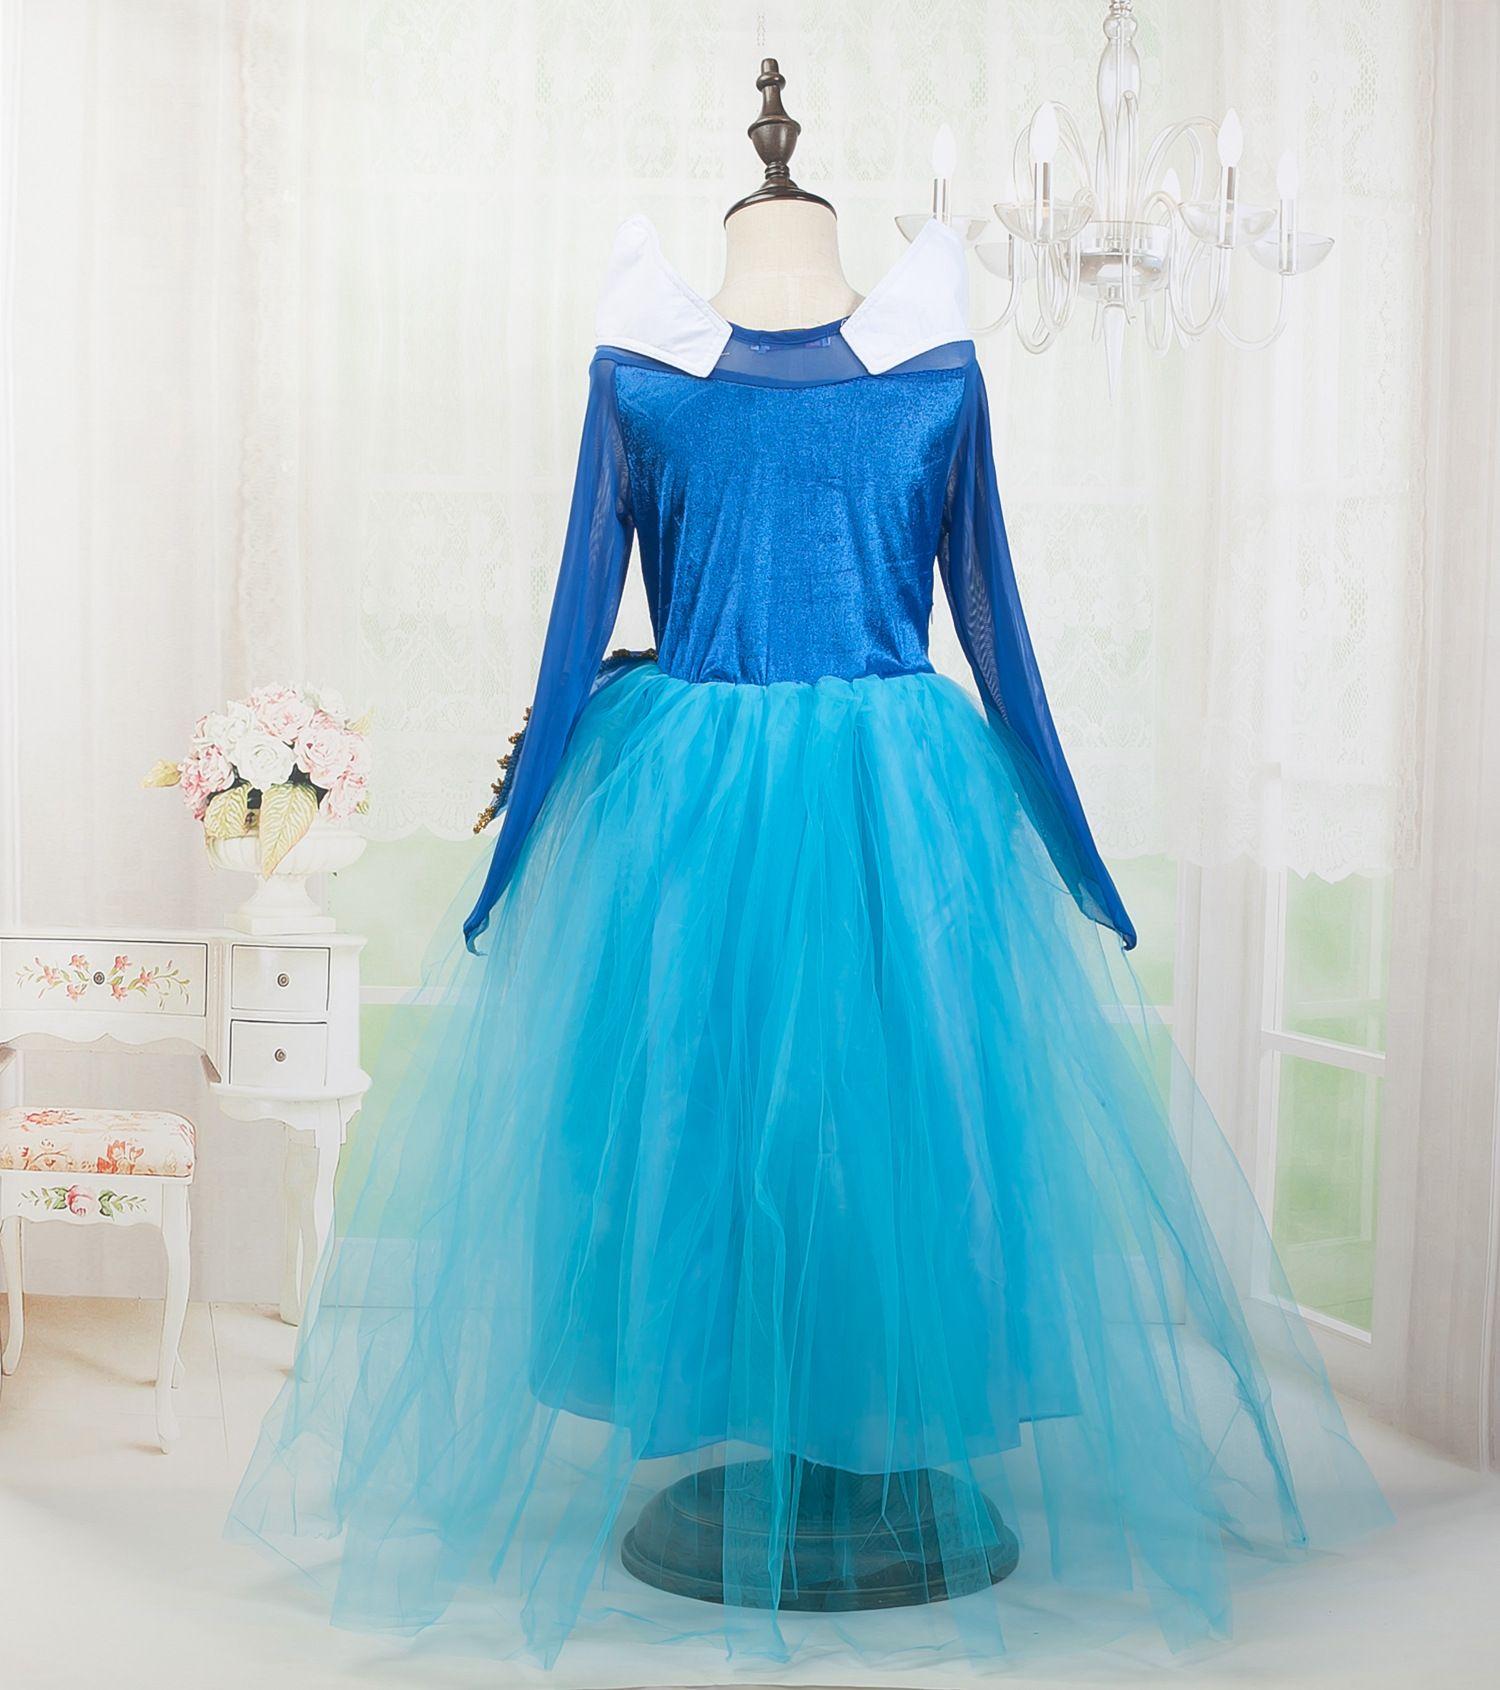 2017 Elegante principessa Dreamlike Gonna Aloha manica lunga blu rosa bambini Beautiful Cenerentola Dress la cena di Natale Cosplay